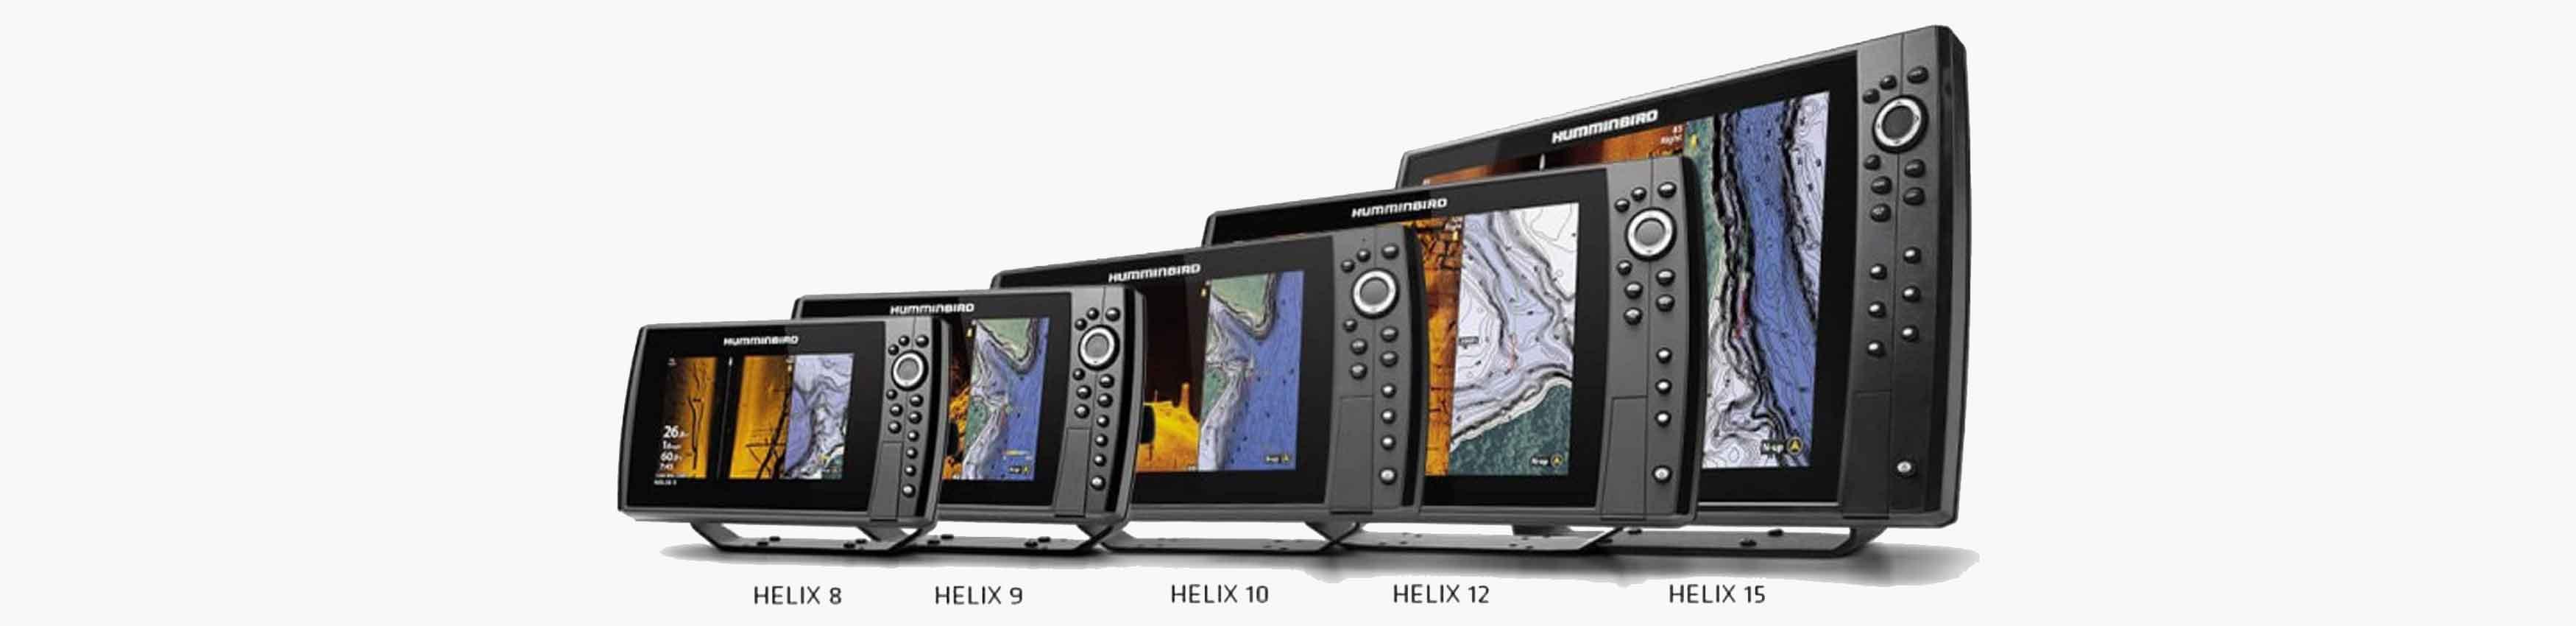 Helix G4